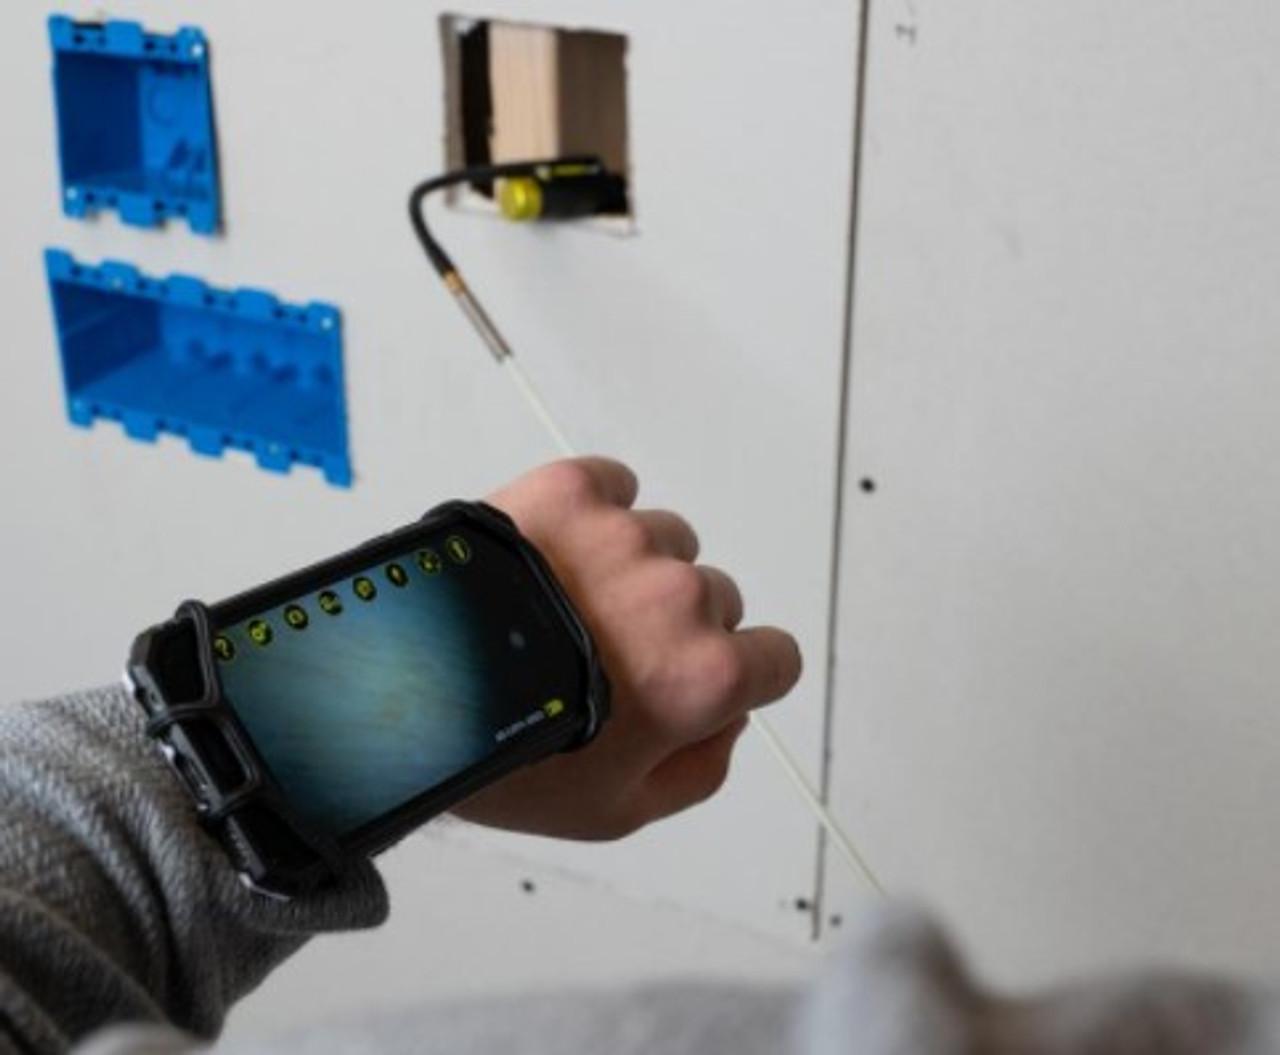 Ferret Plus - Multipurpose Wireless Inspection Camera & Cable Pulling Tool